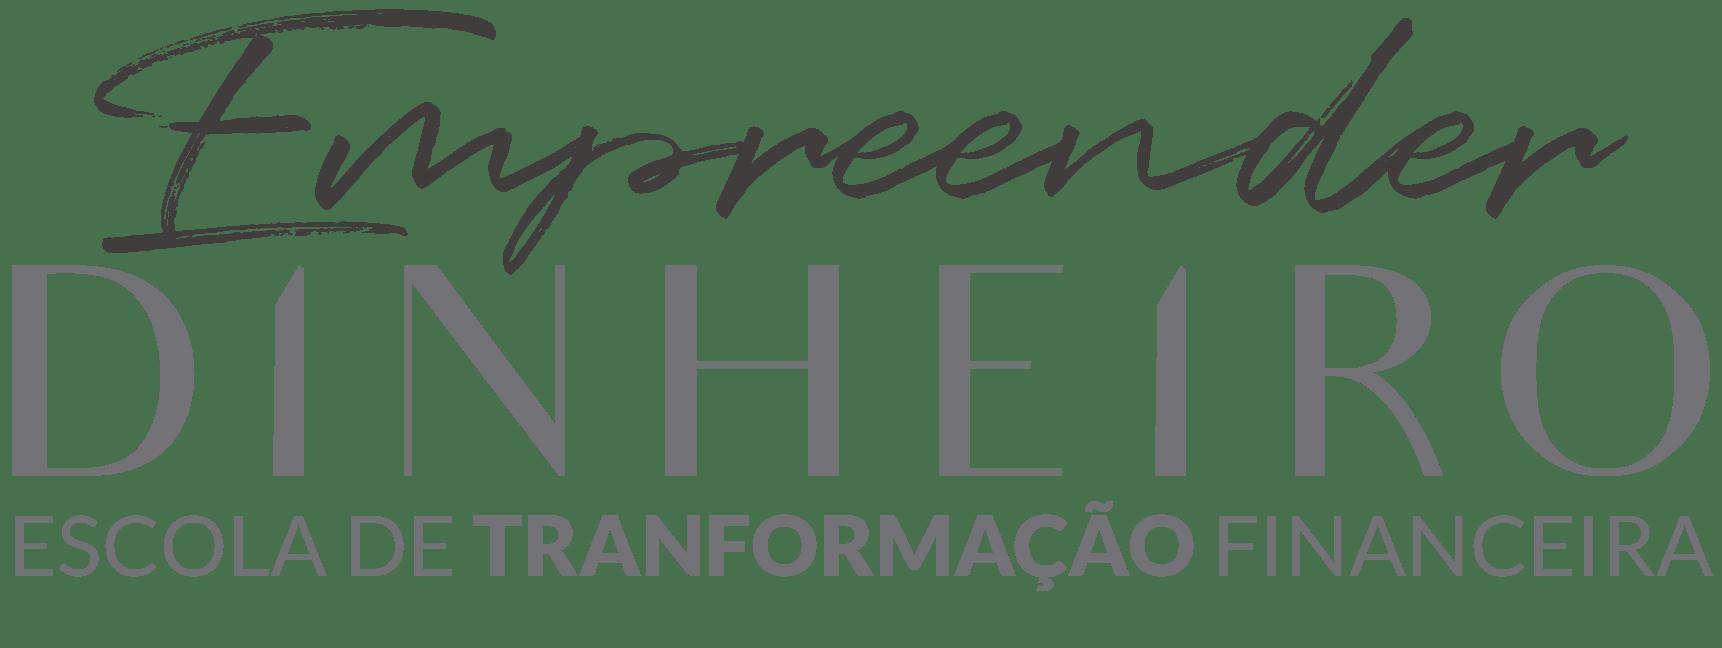 logotipo empreender dinheiro principal 2